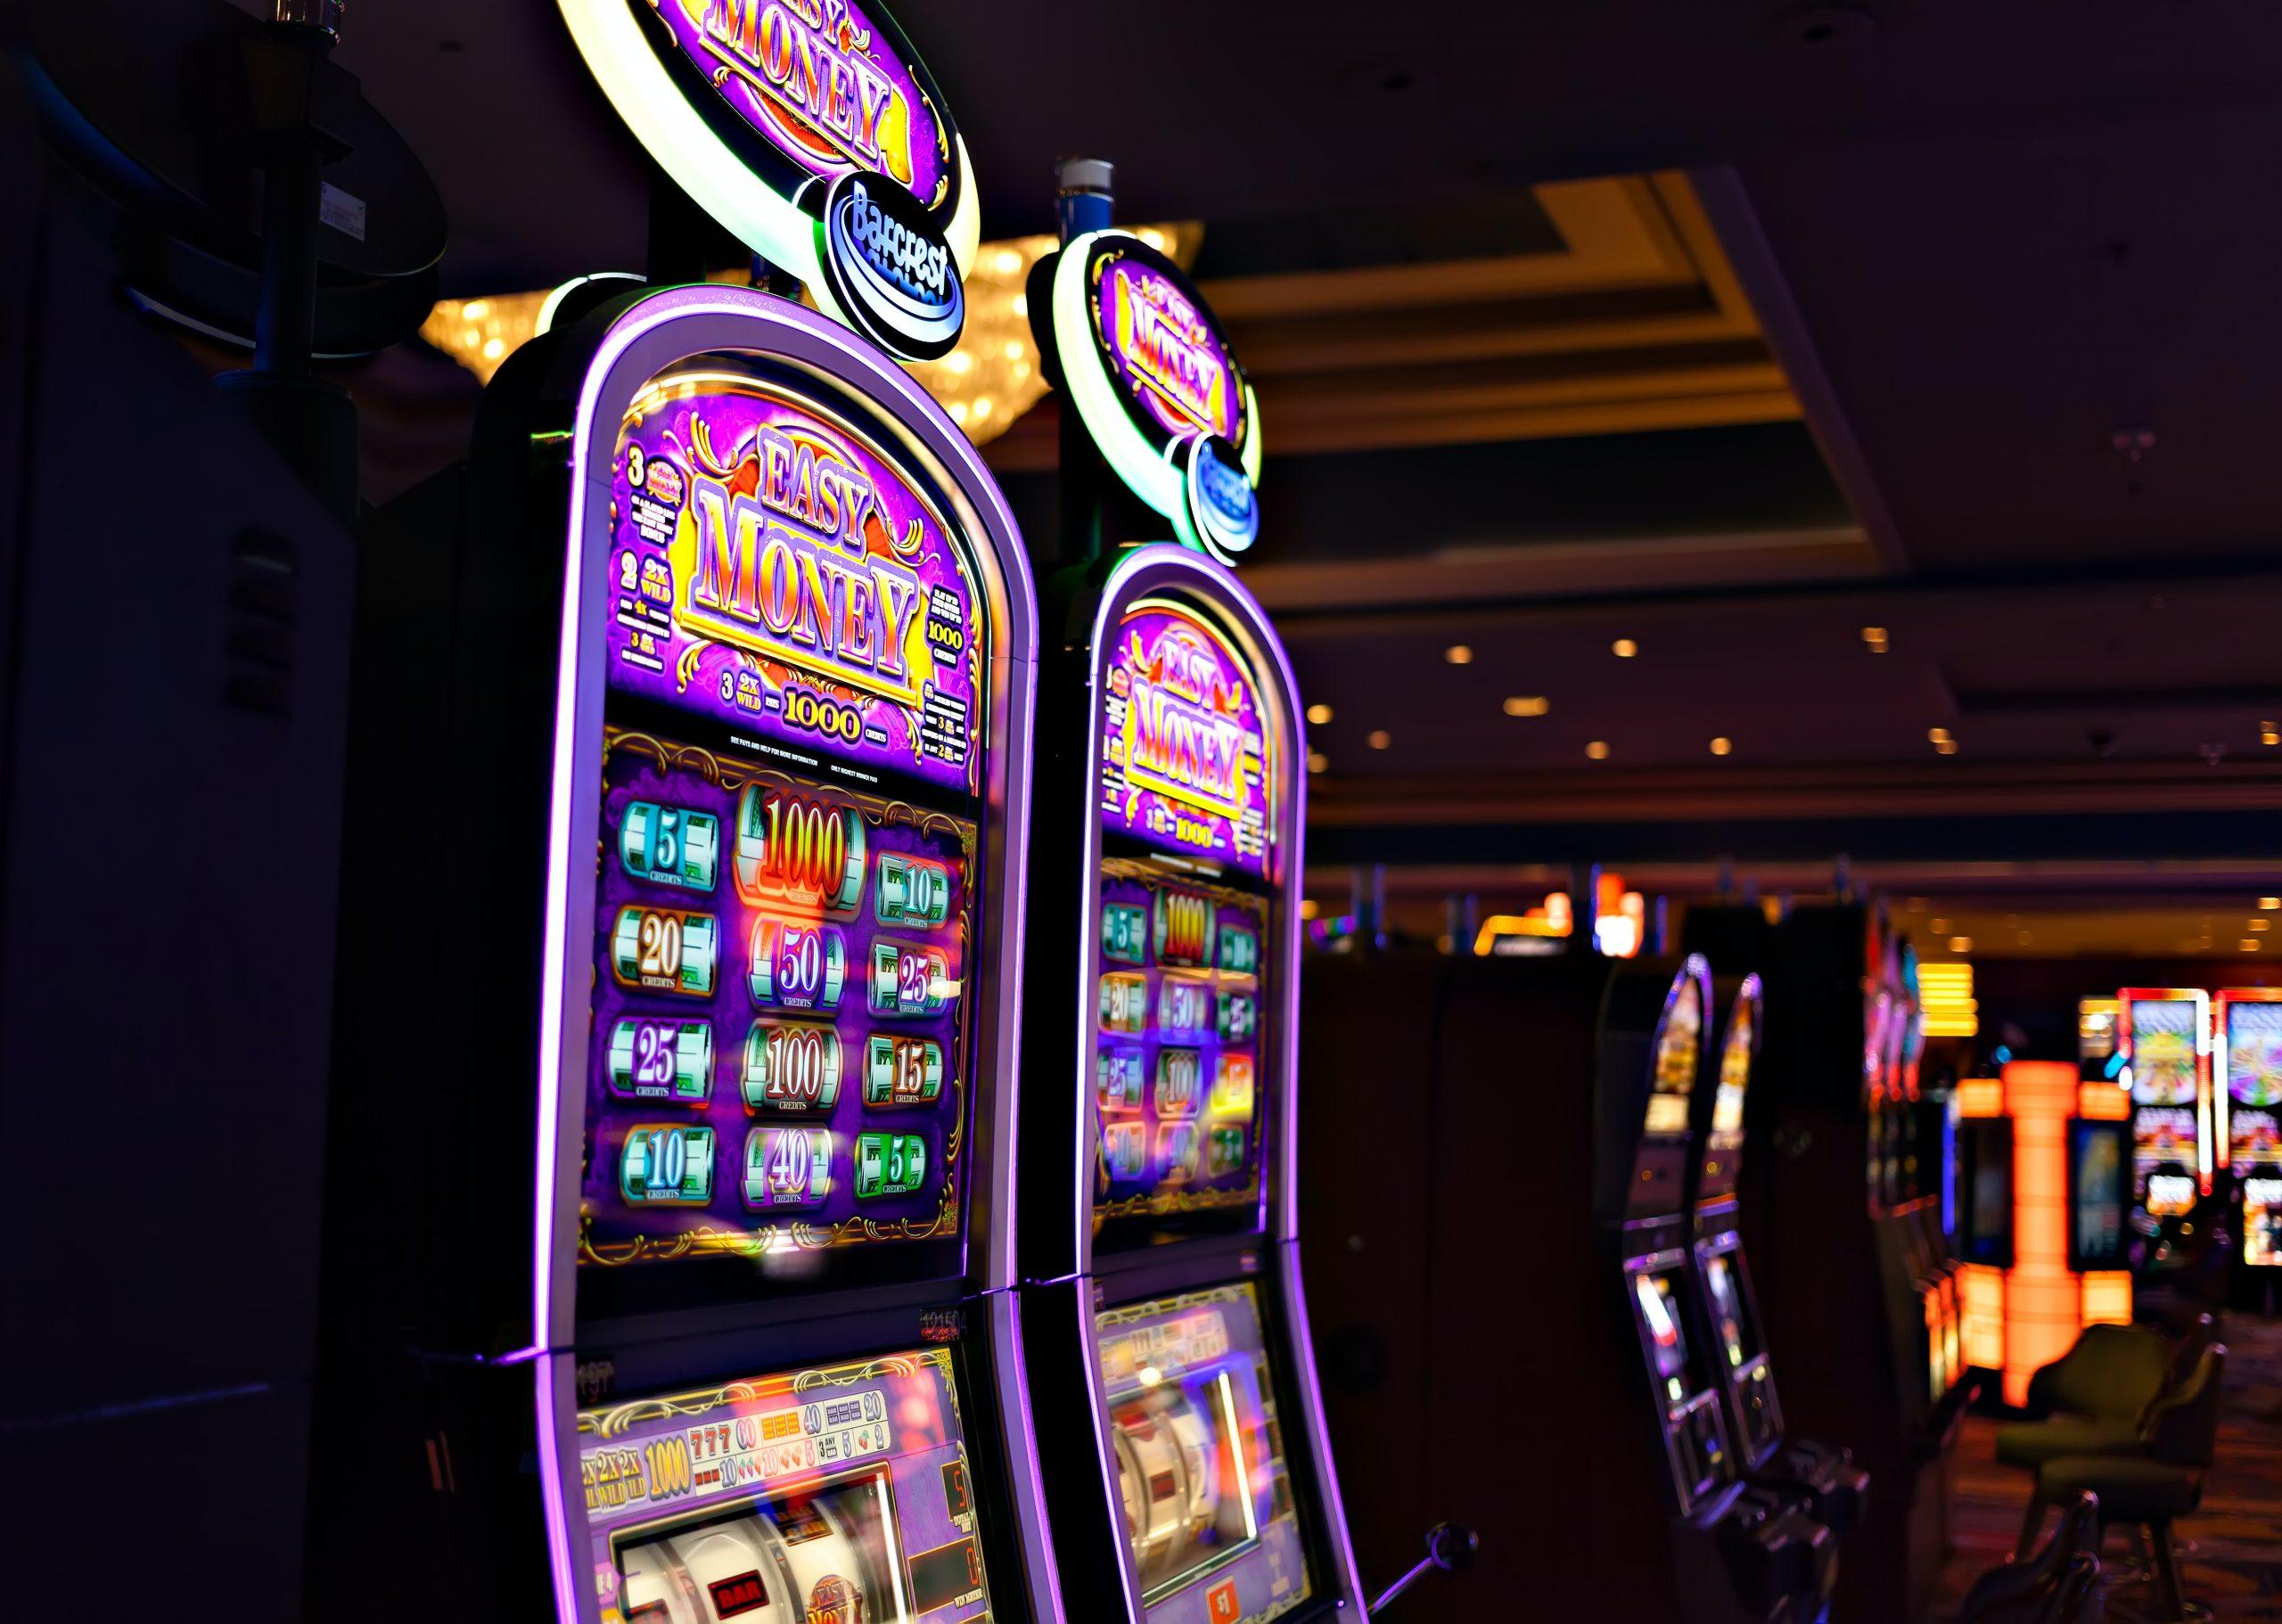 online-gambling-playersonline-gambling-players